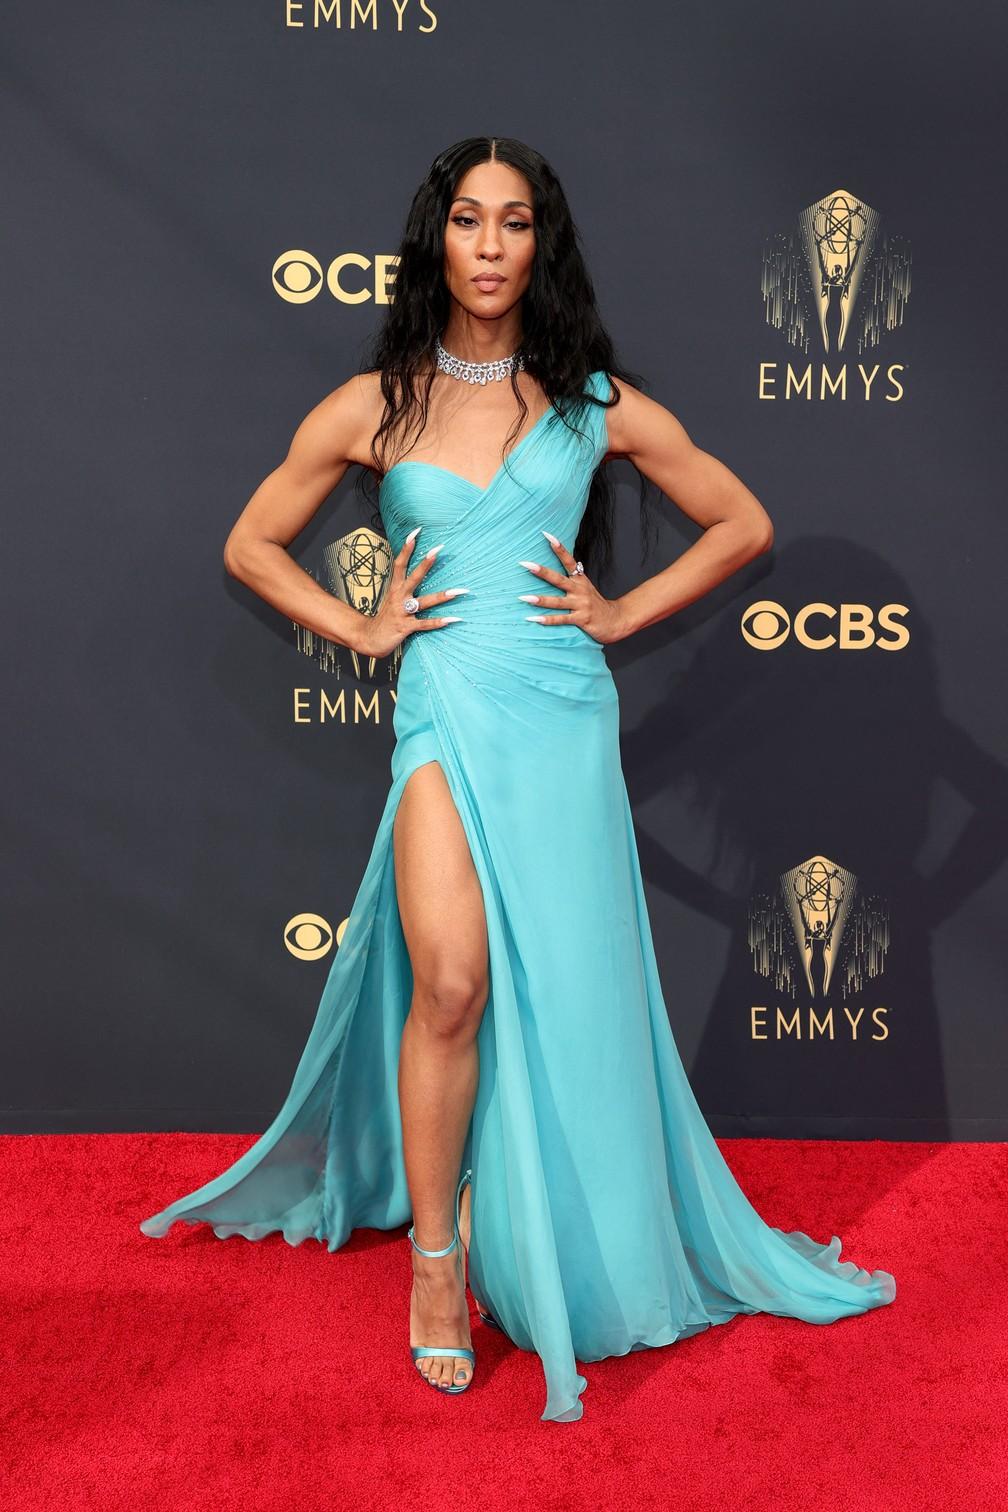 Michaela Jaé Rodriguez chega ao Emmy 2021 — Foto: Rich Fury/Getty Images North America/Getty Images via AFP